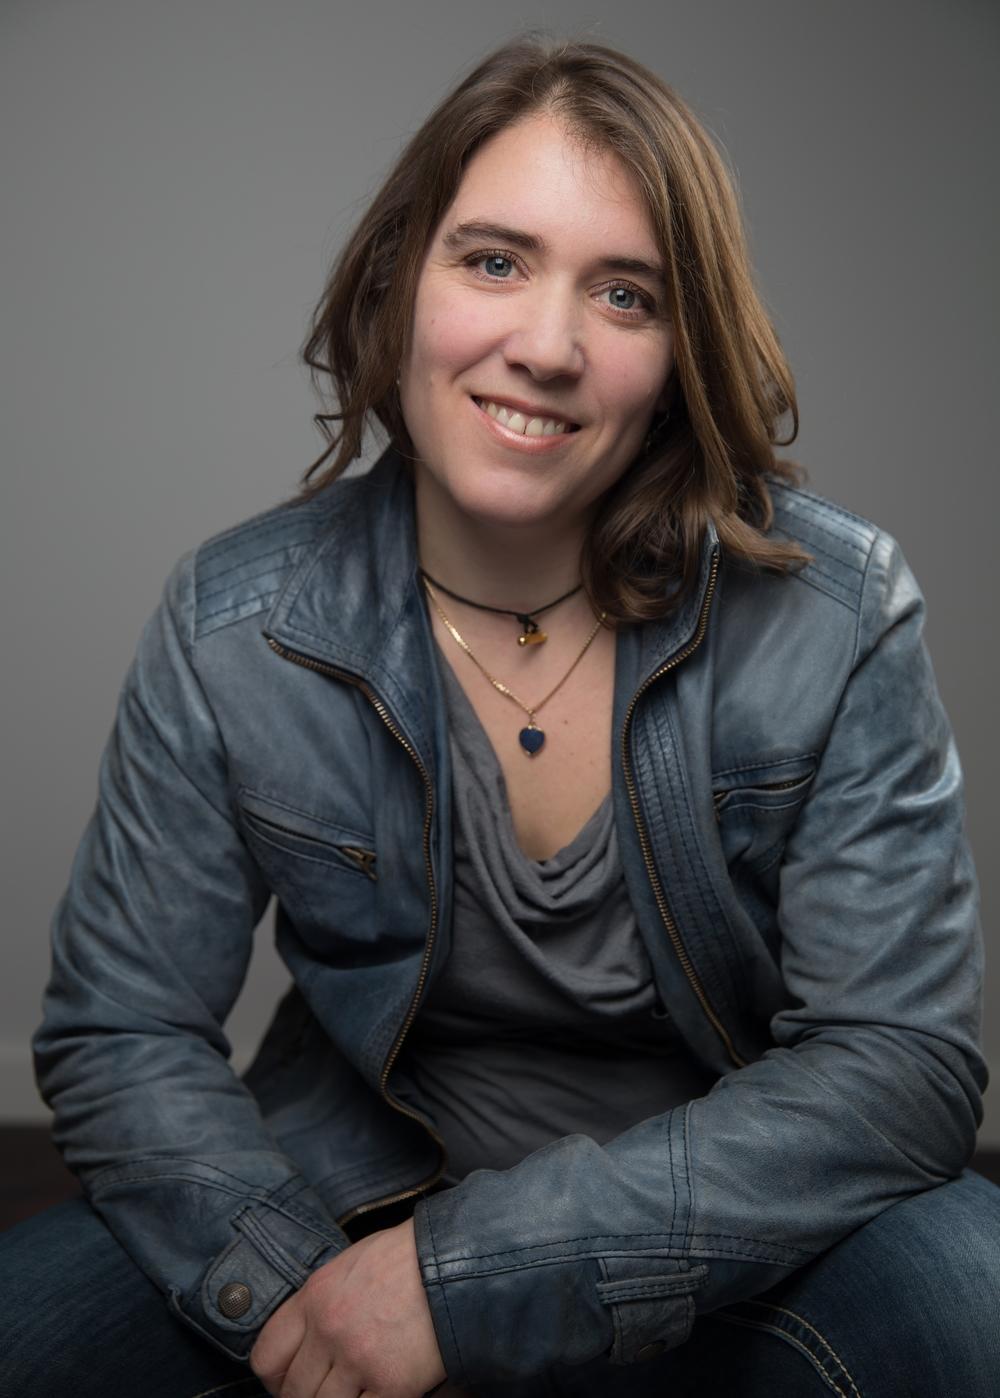 Jen Walden, photo by Tara Marchiori